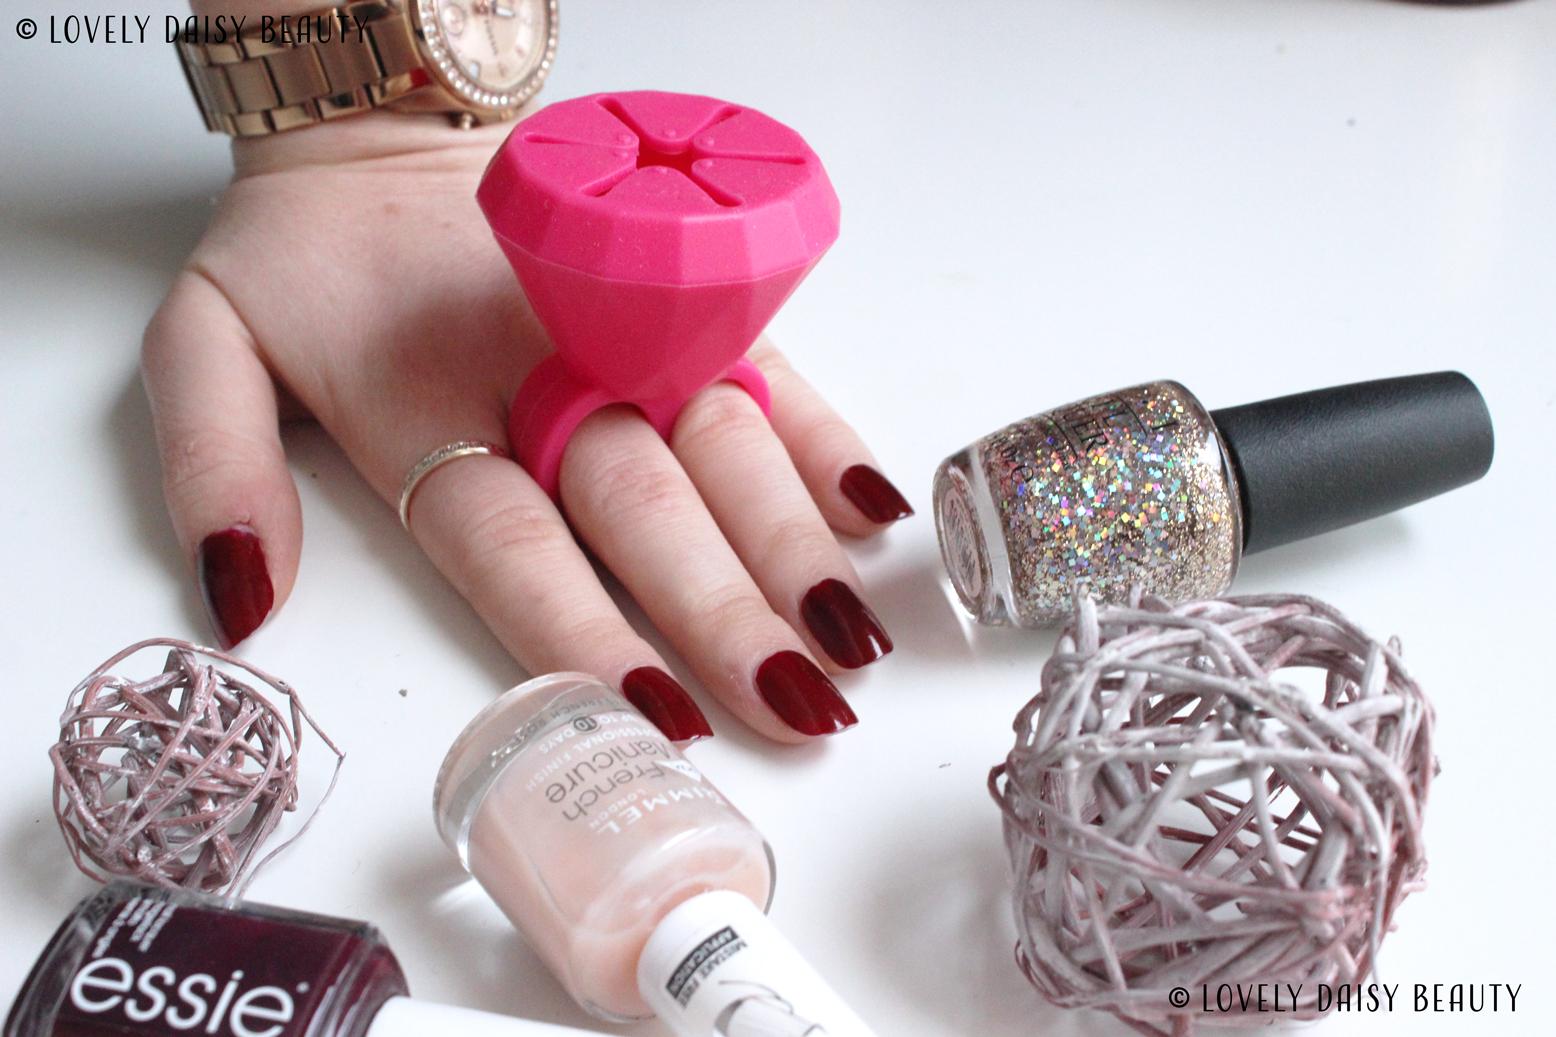 nail-polish-holder-primark4